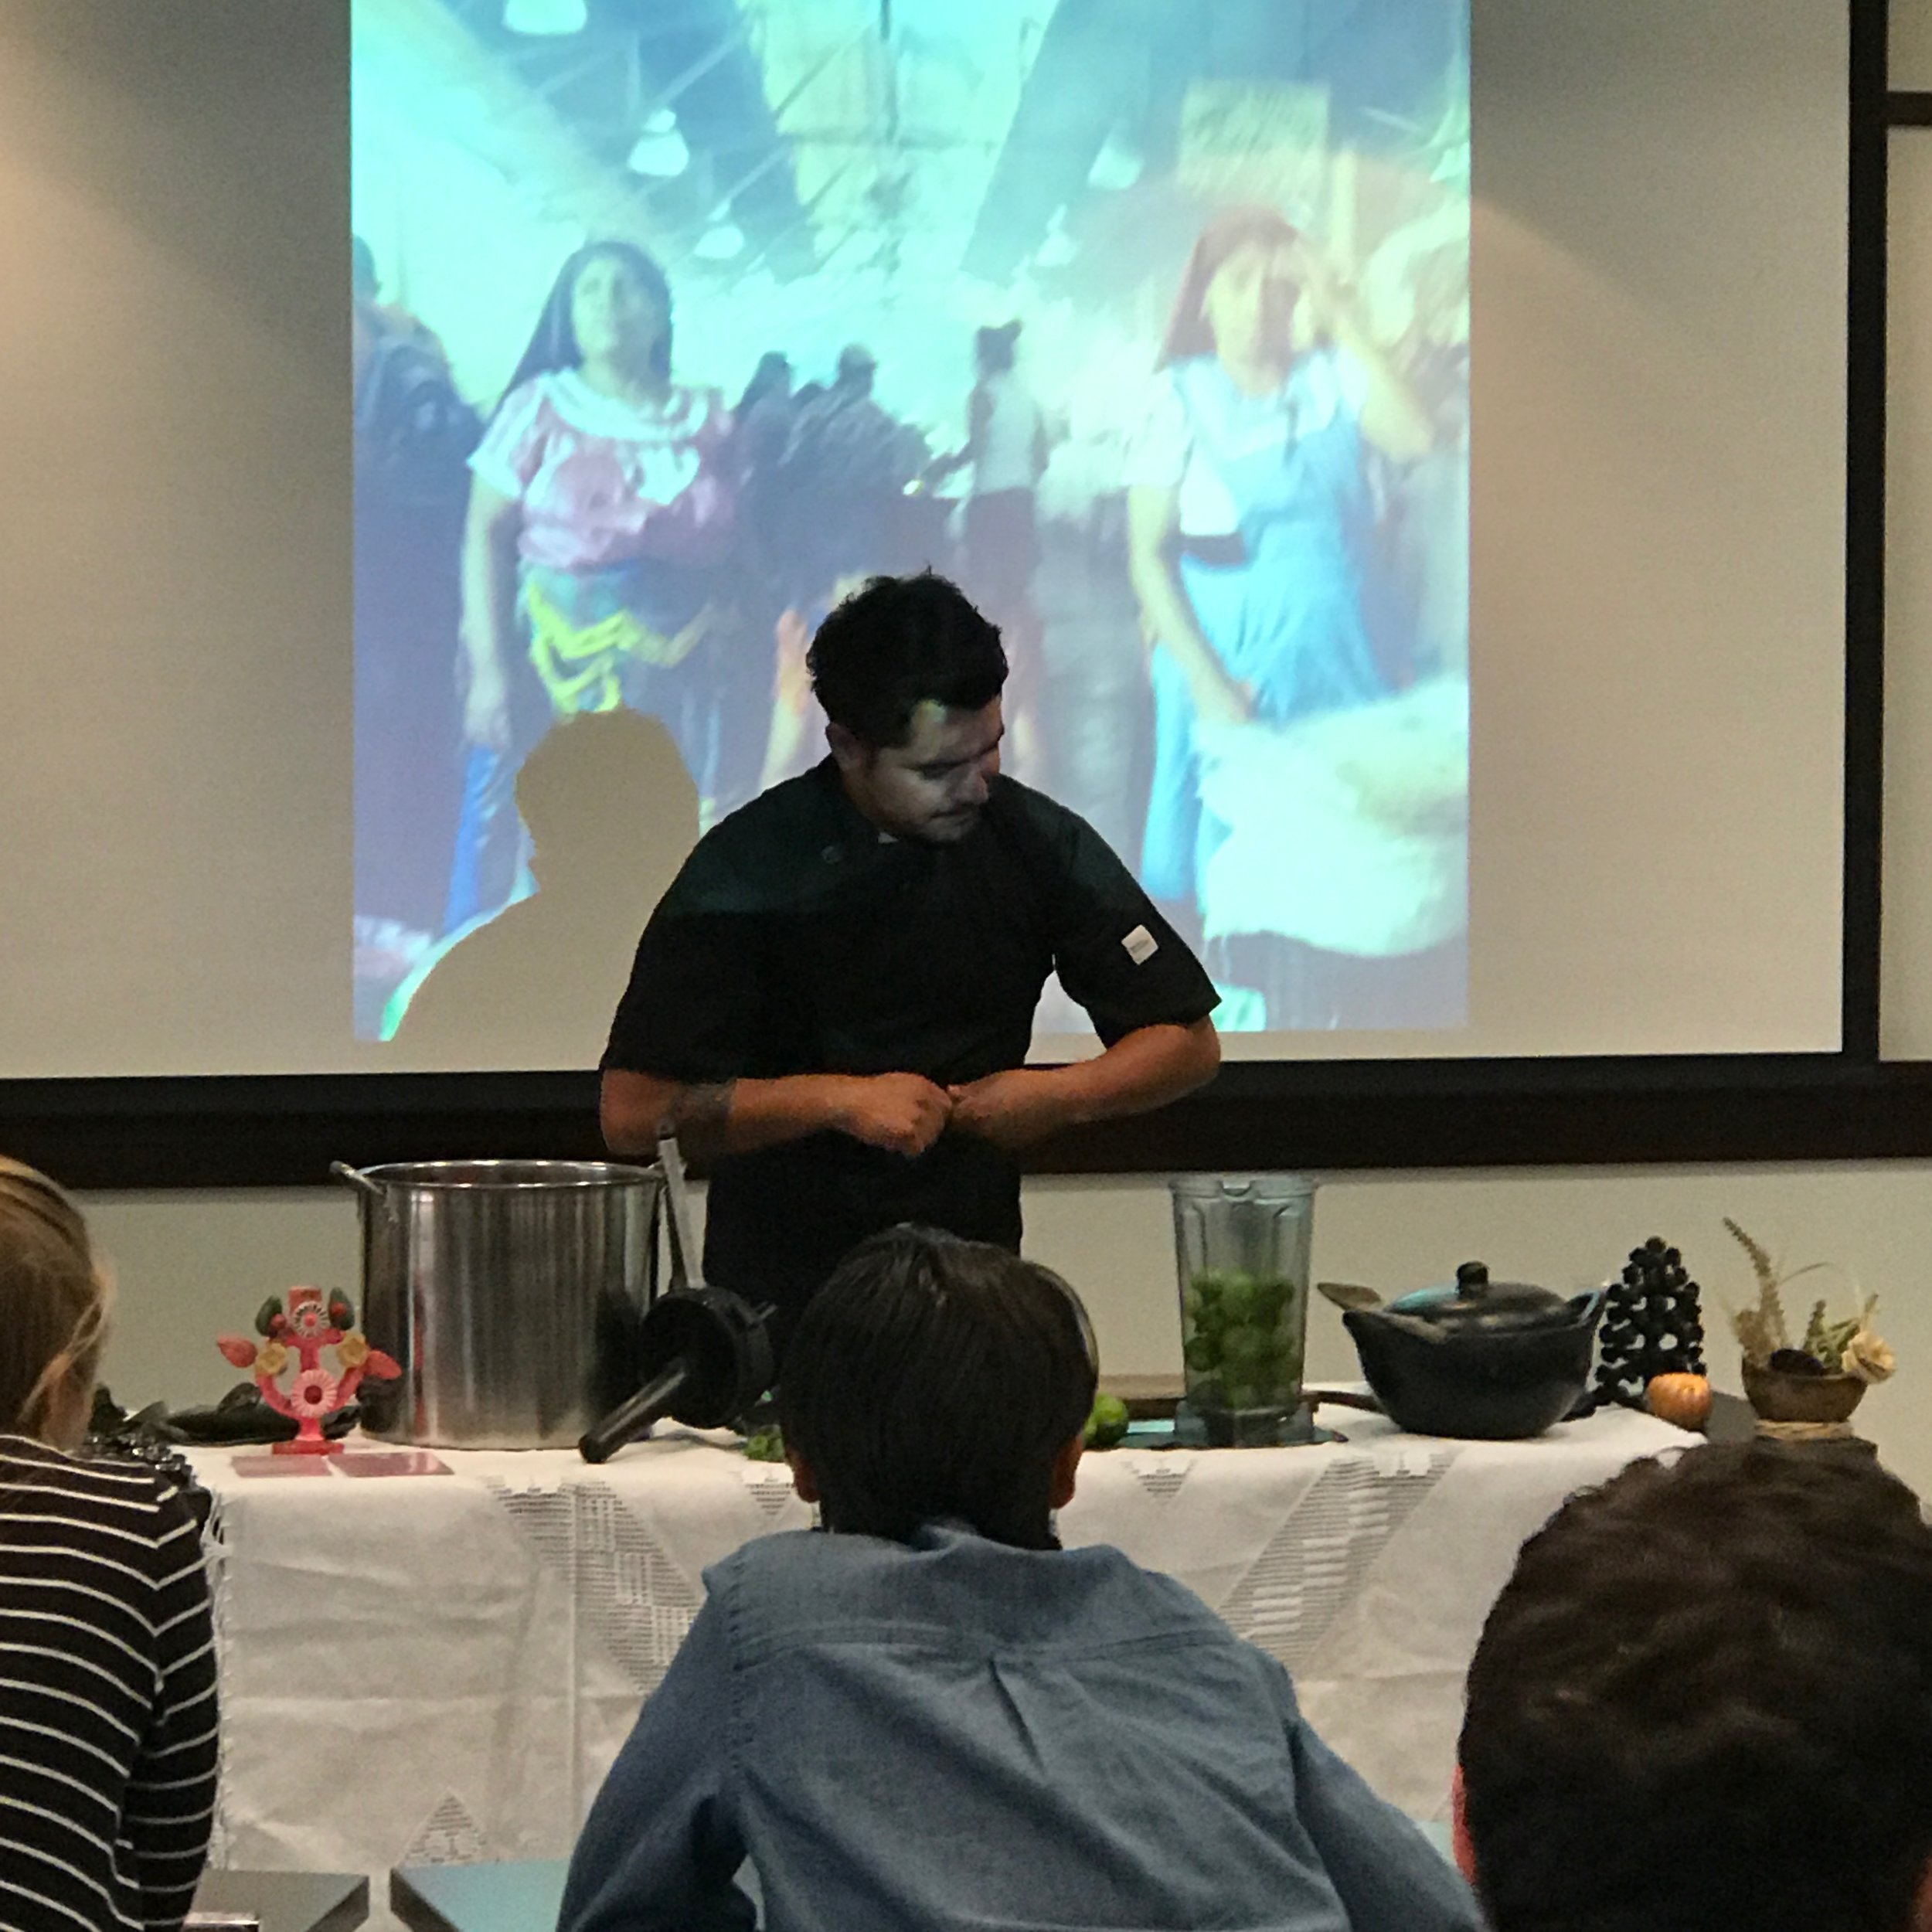 cooking demonstration Evanta portland oregon